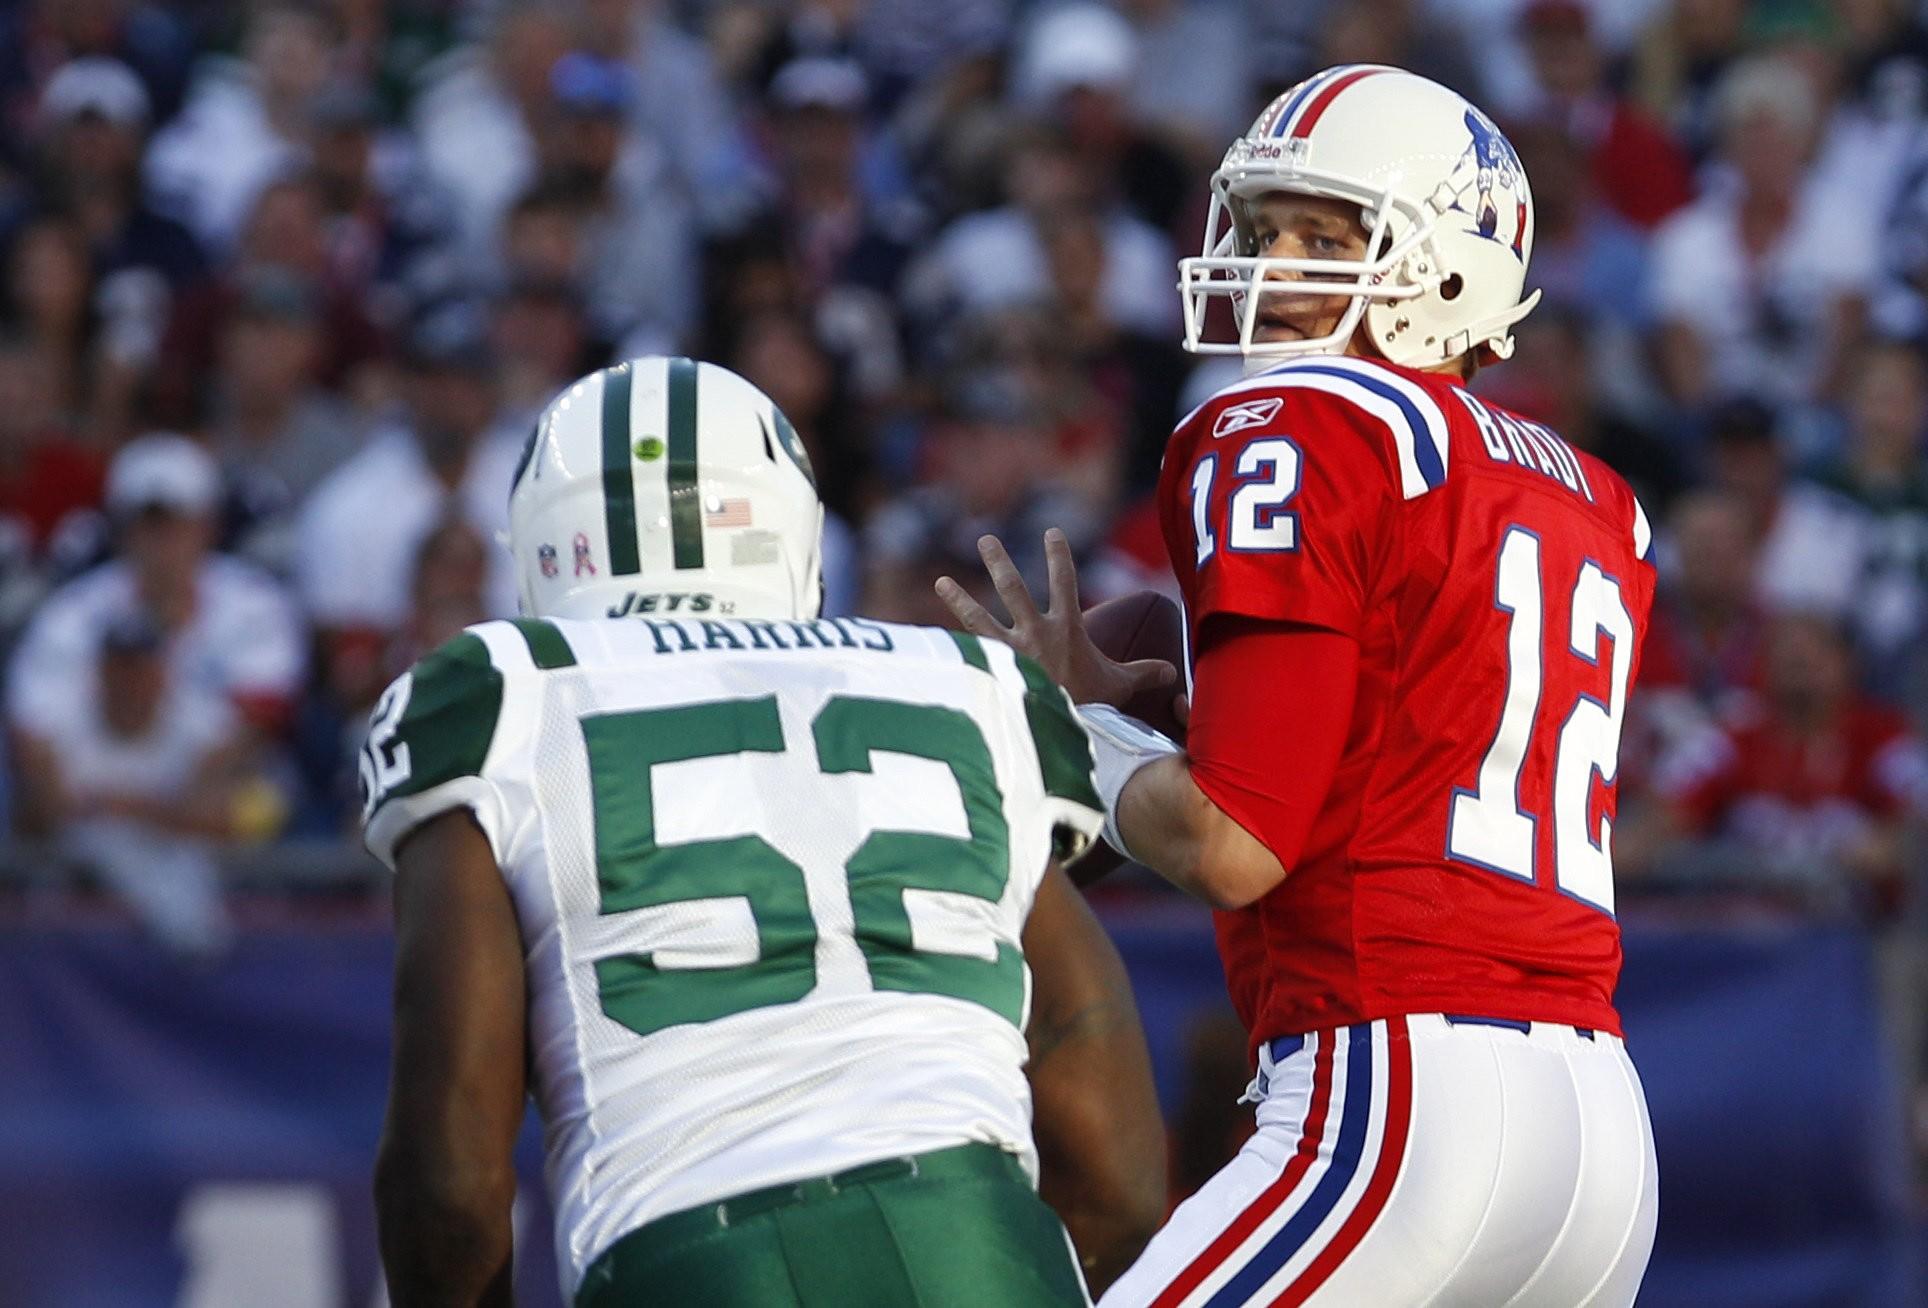 Former Jets linebacker David Harris retiring from NFL - nj.com